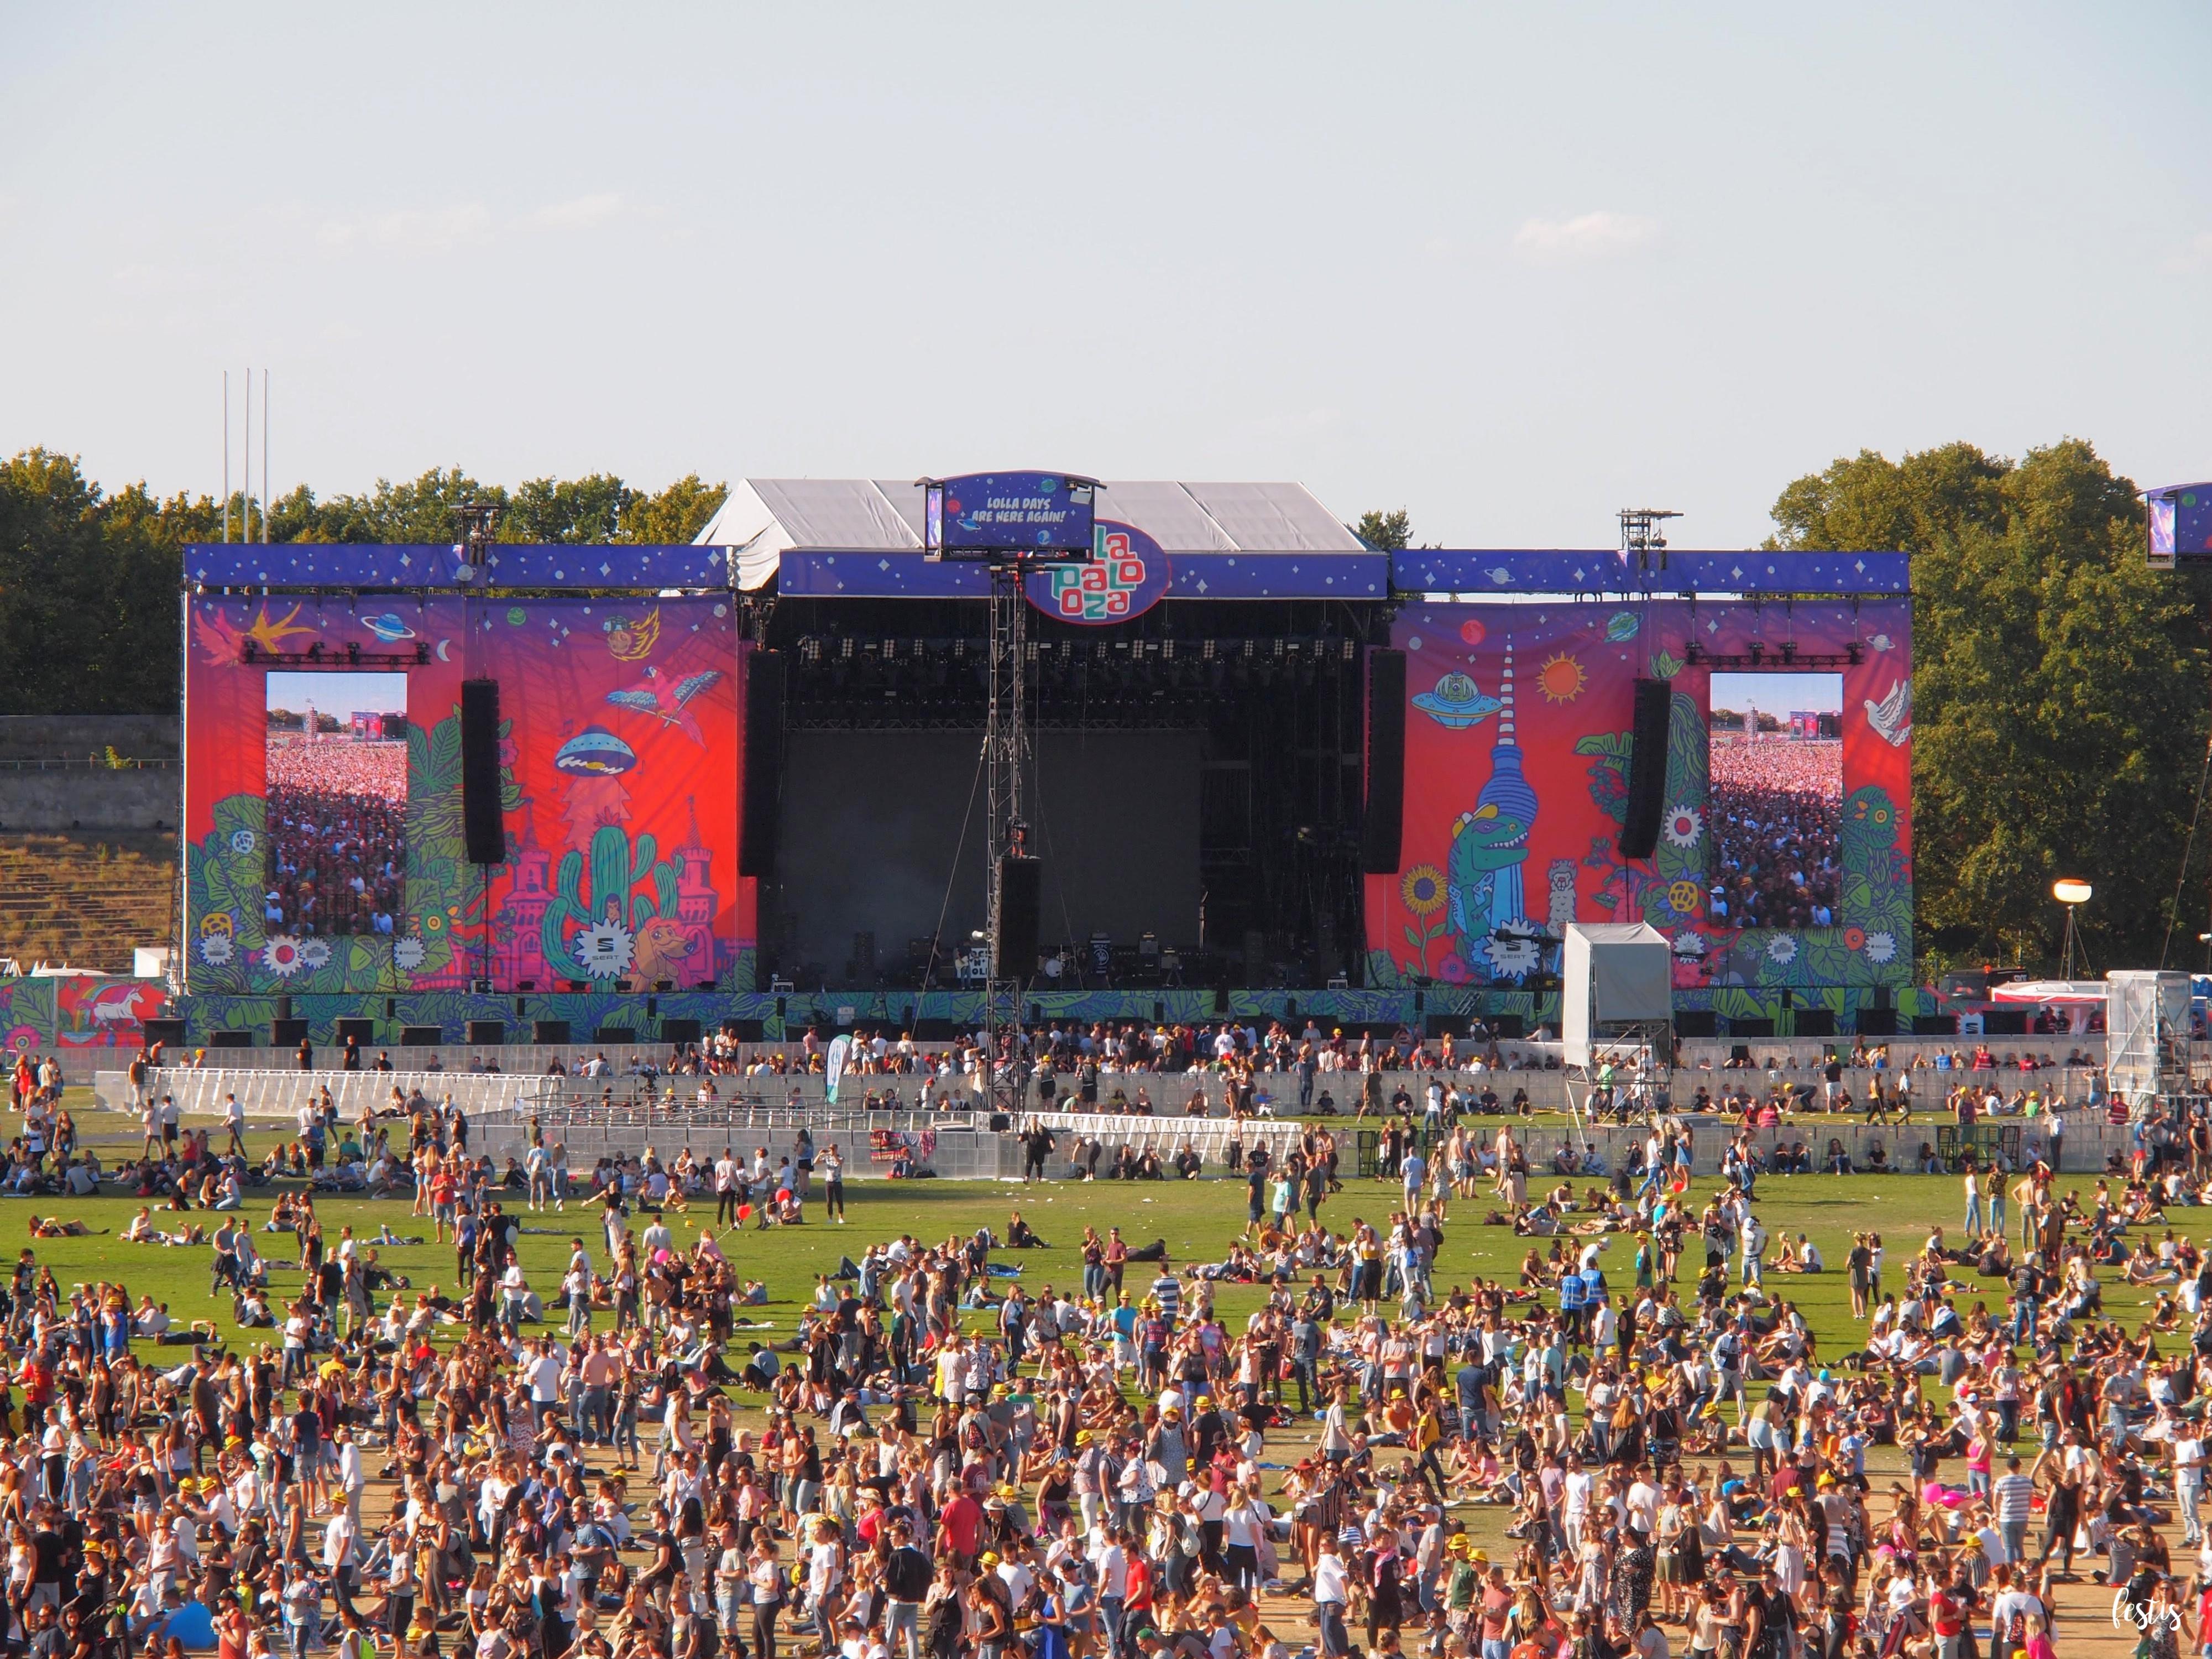 Lollapalooza Berlín 2018